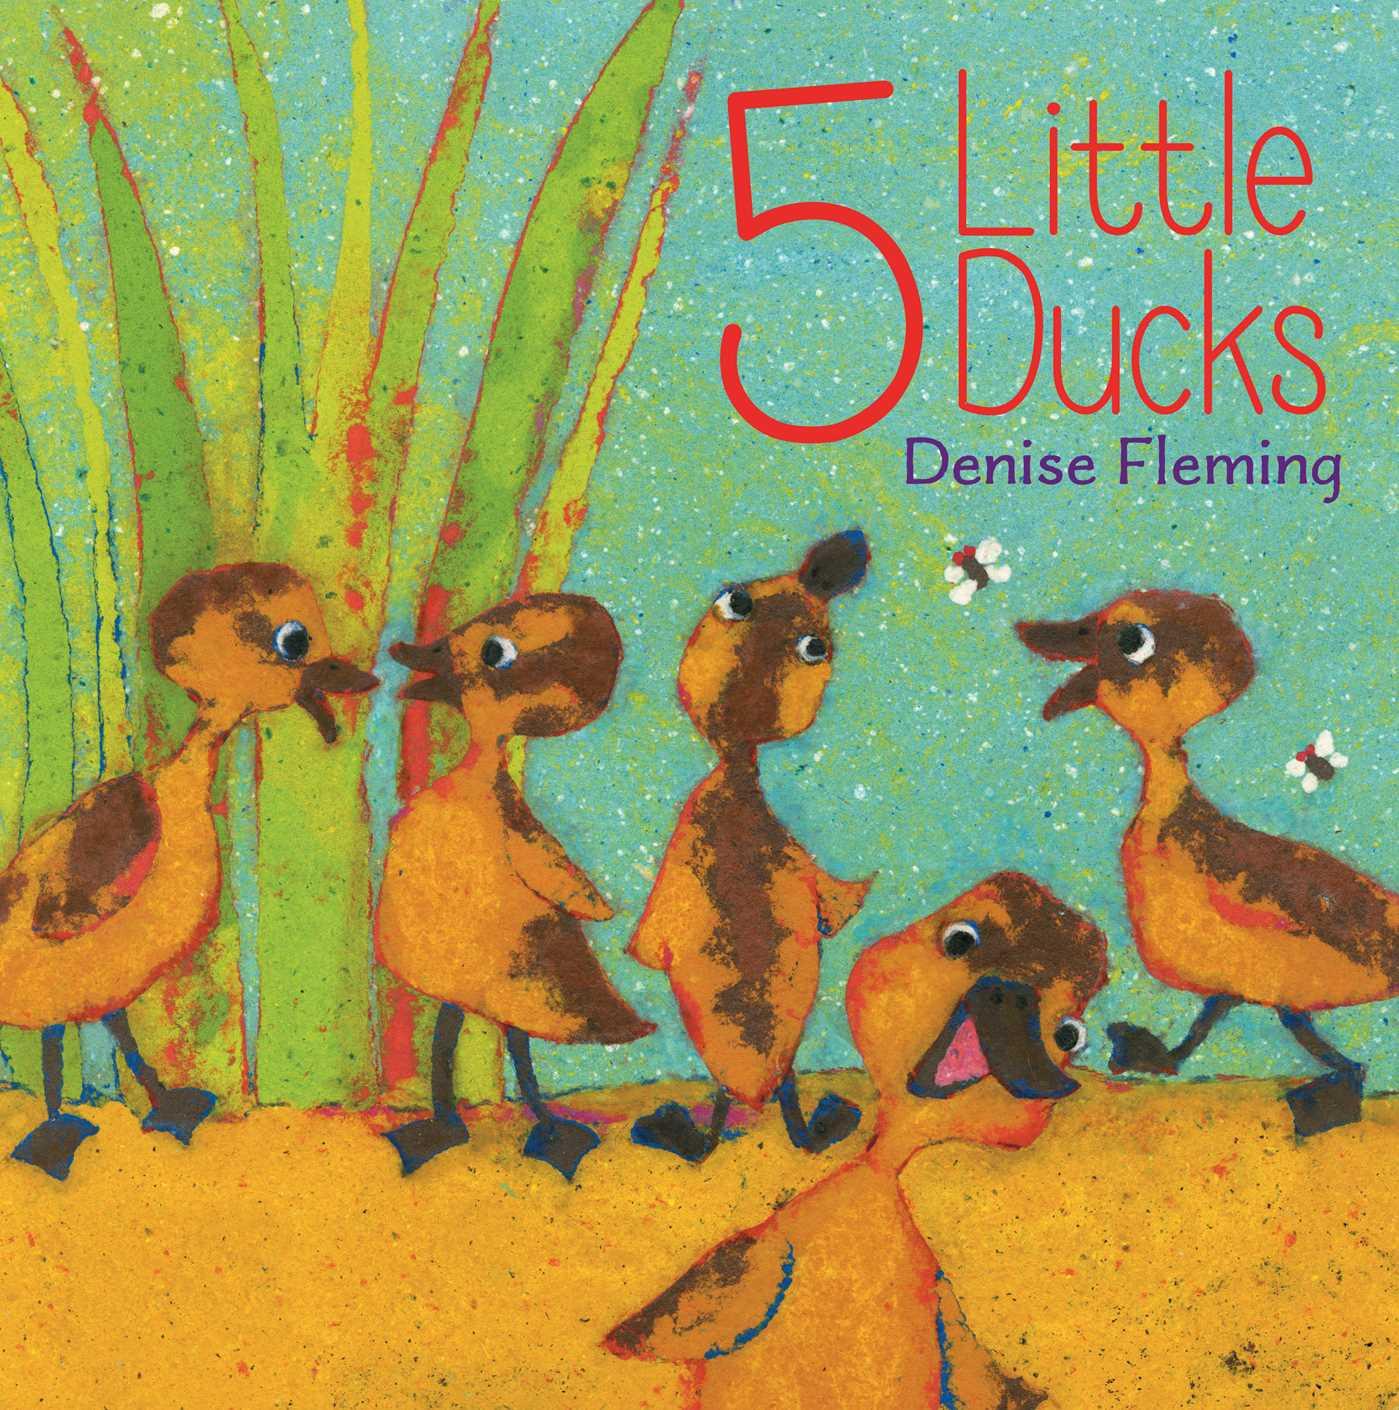 5 little ducks 9781481424233 hr